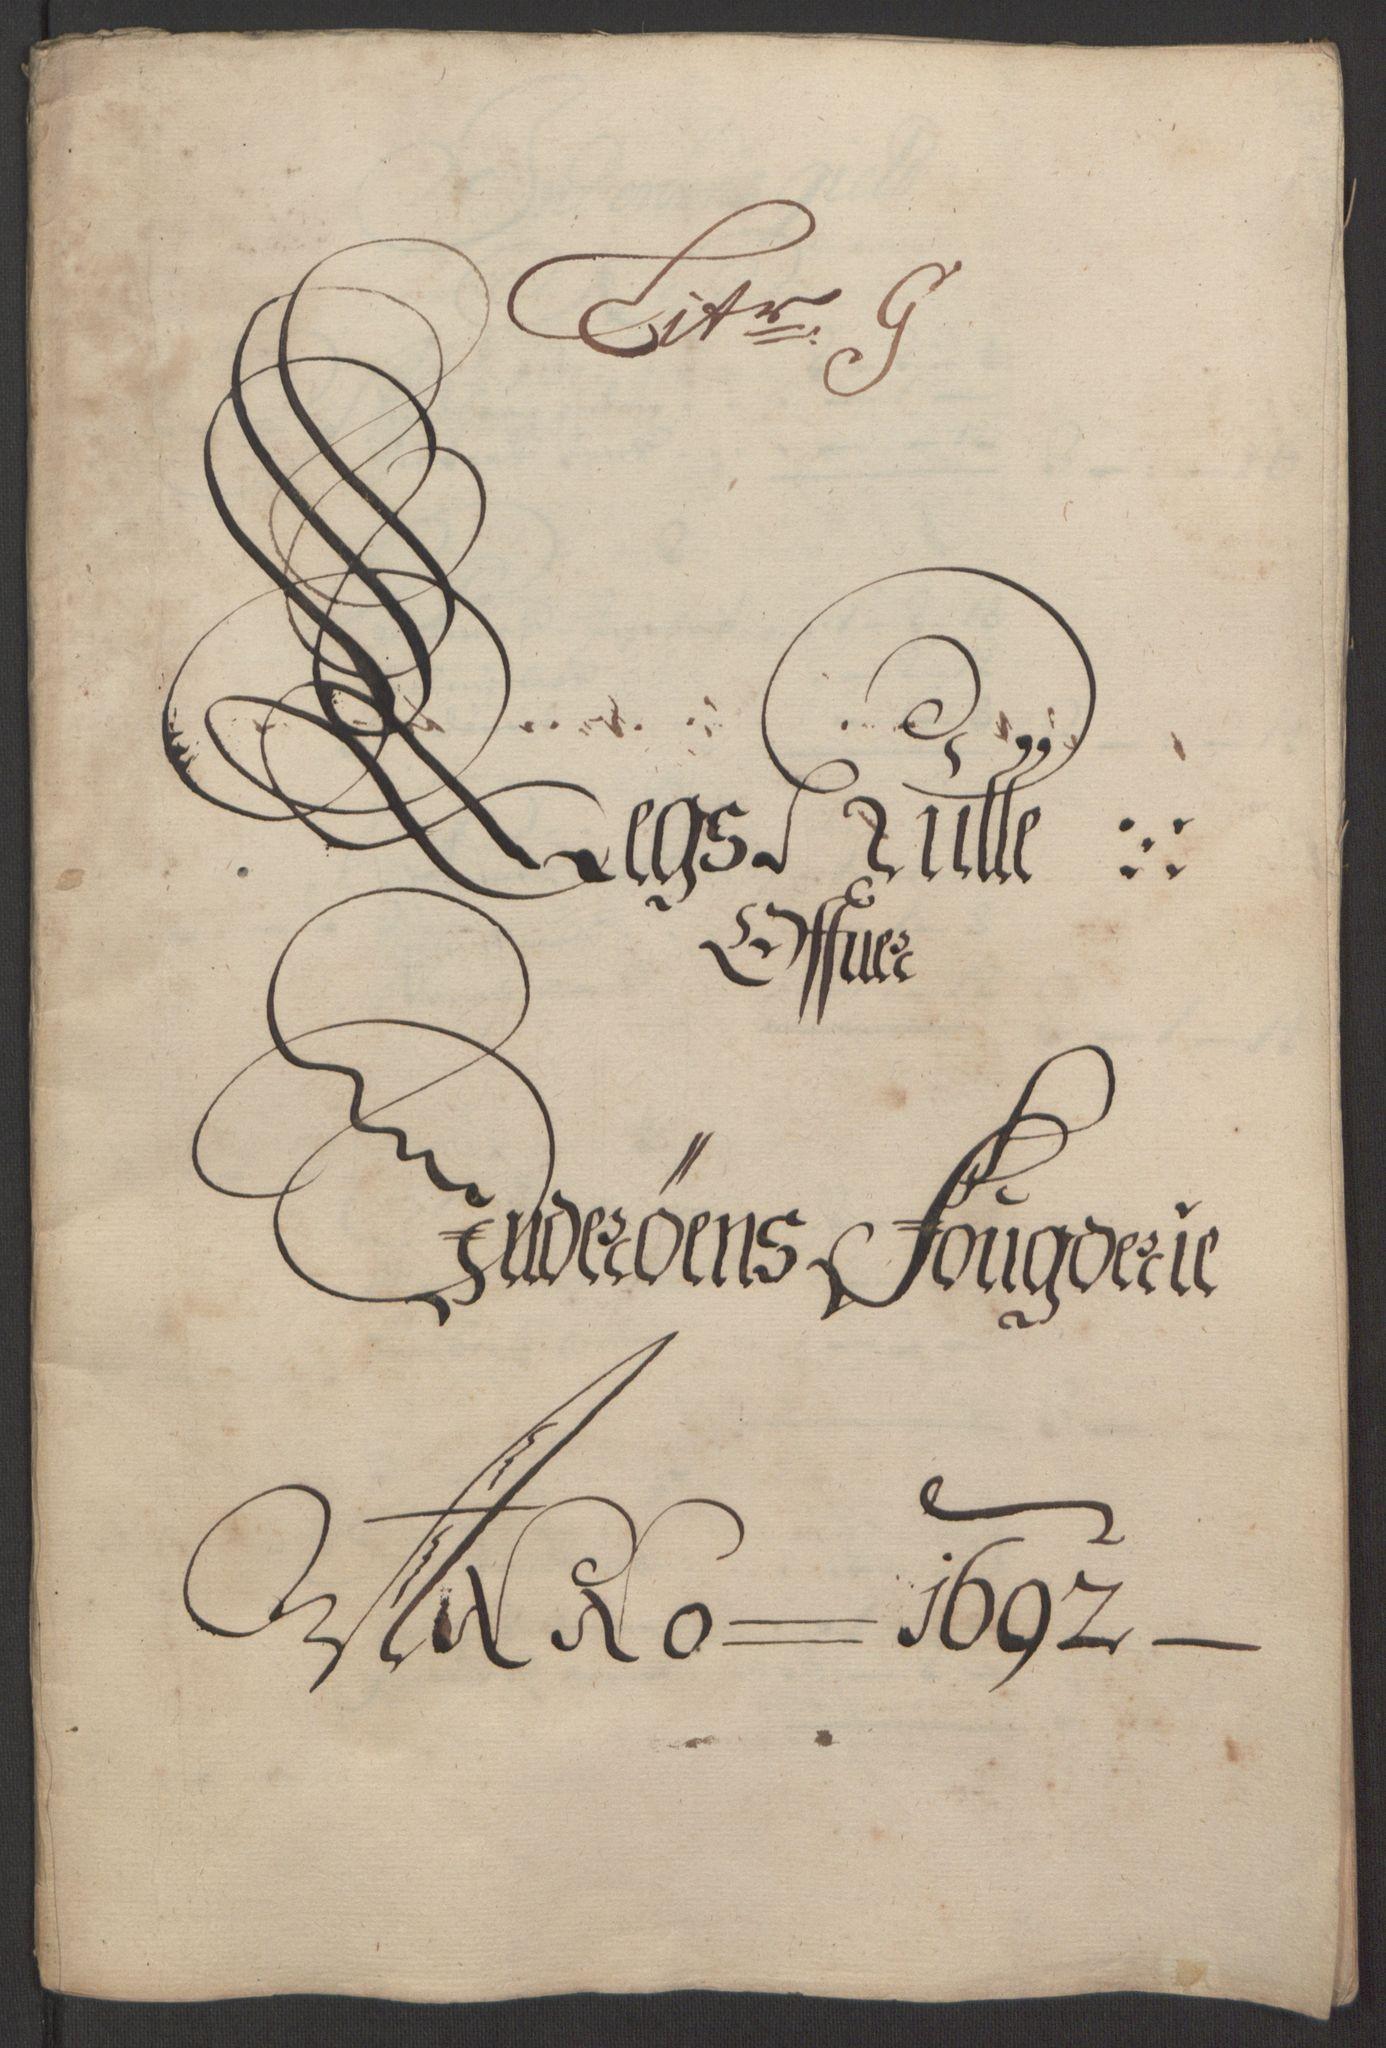 RA, Rentekammeret inntil 1814, Reviderte regnskaper, Fogderegnskap, R63/L4308: Fogderegnskap Inderøy, 1692-1694, s. 93